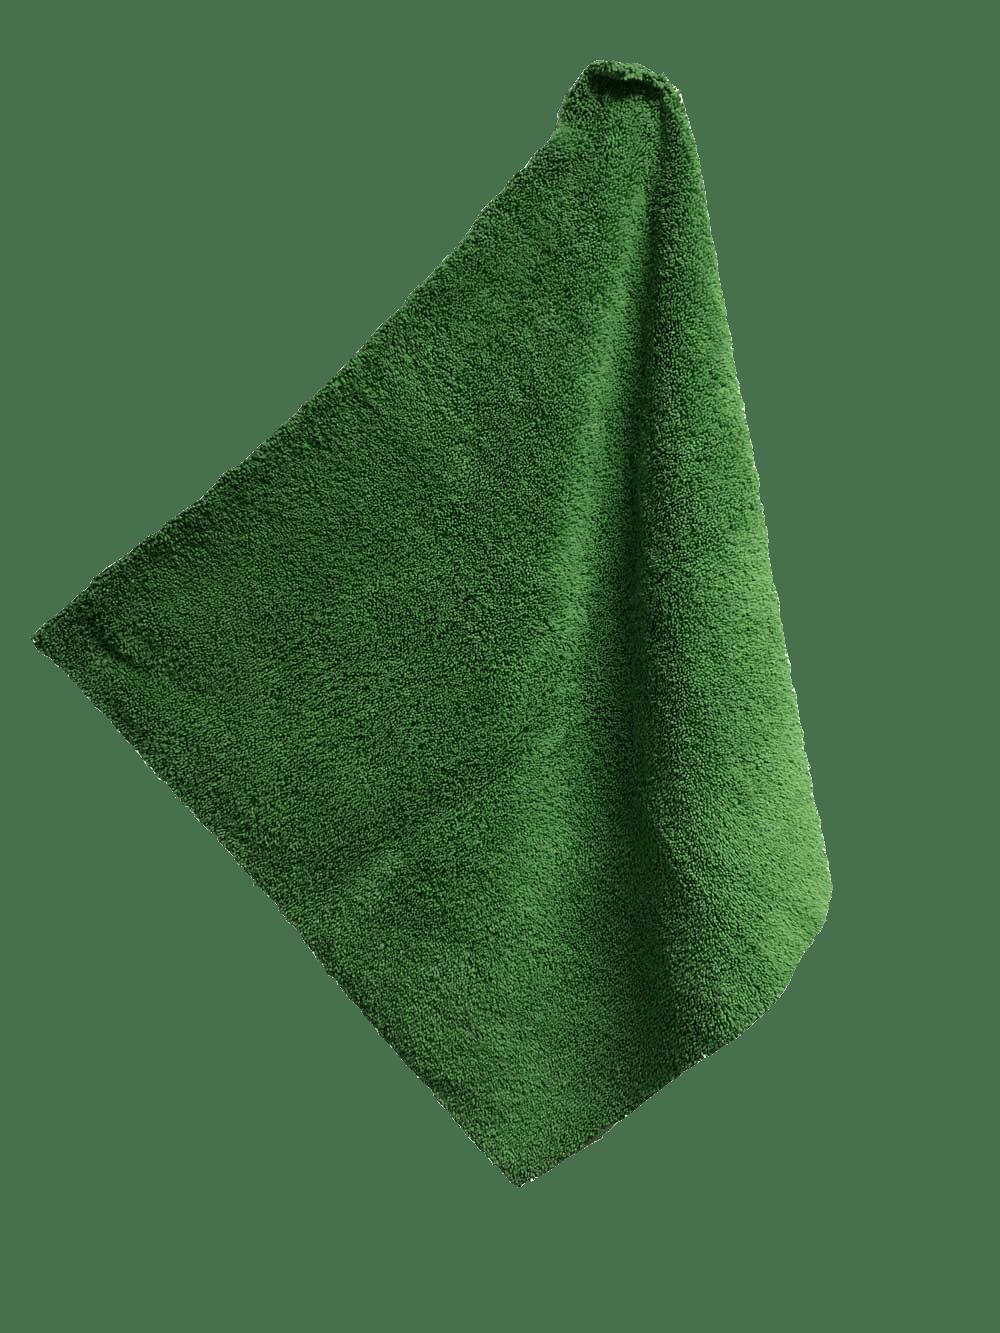 green-mf-duk_grande-min